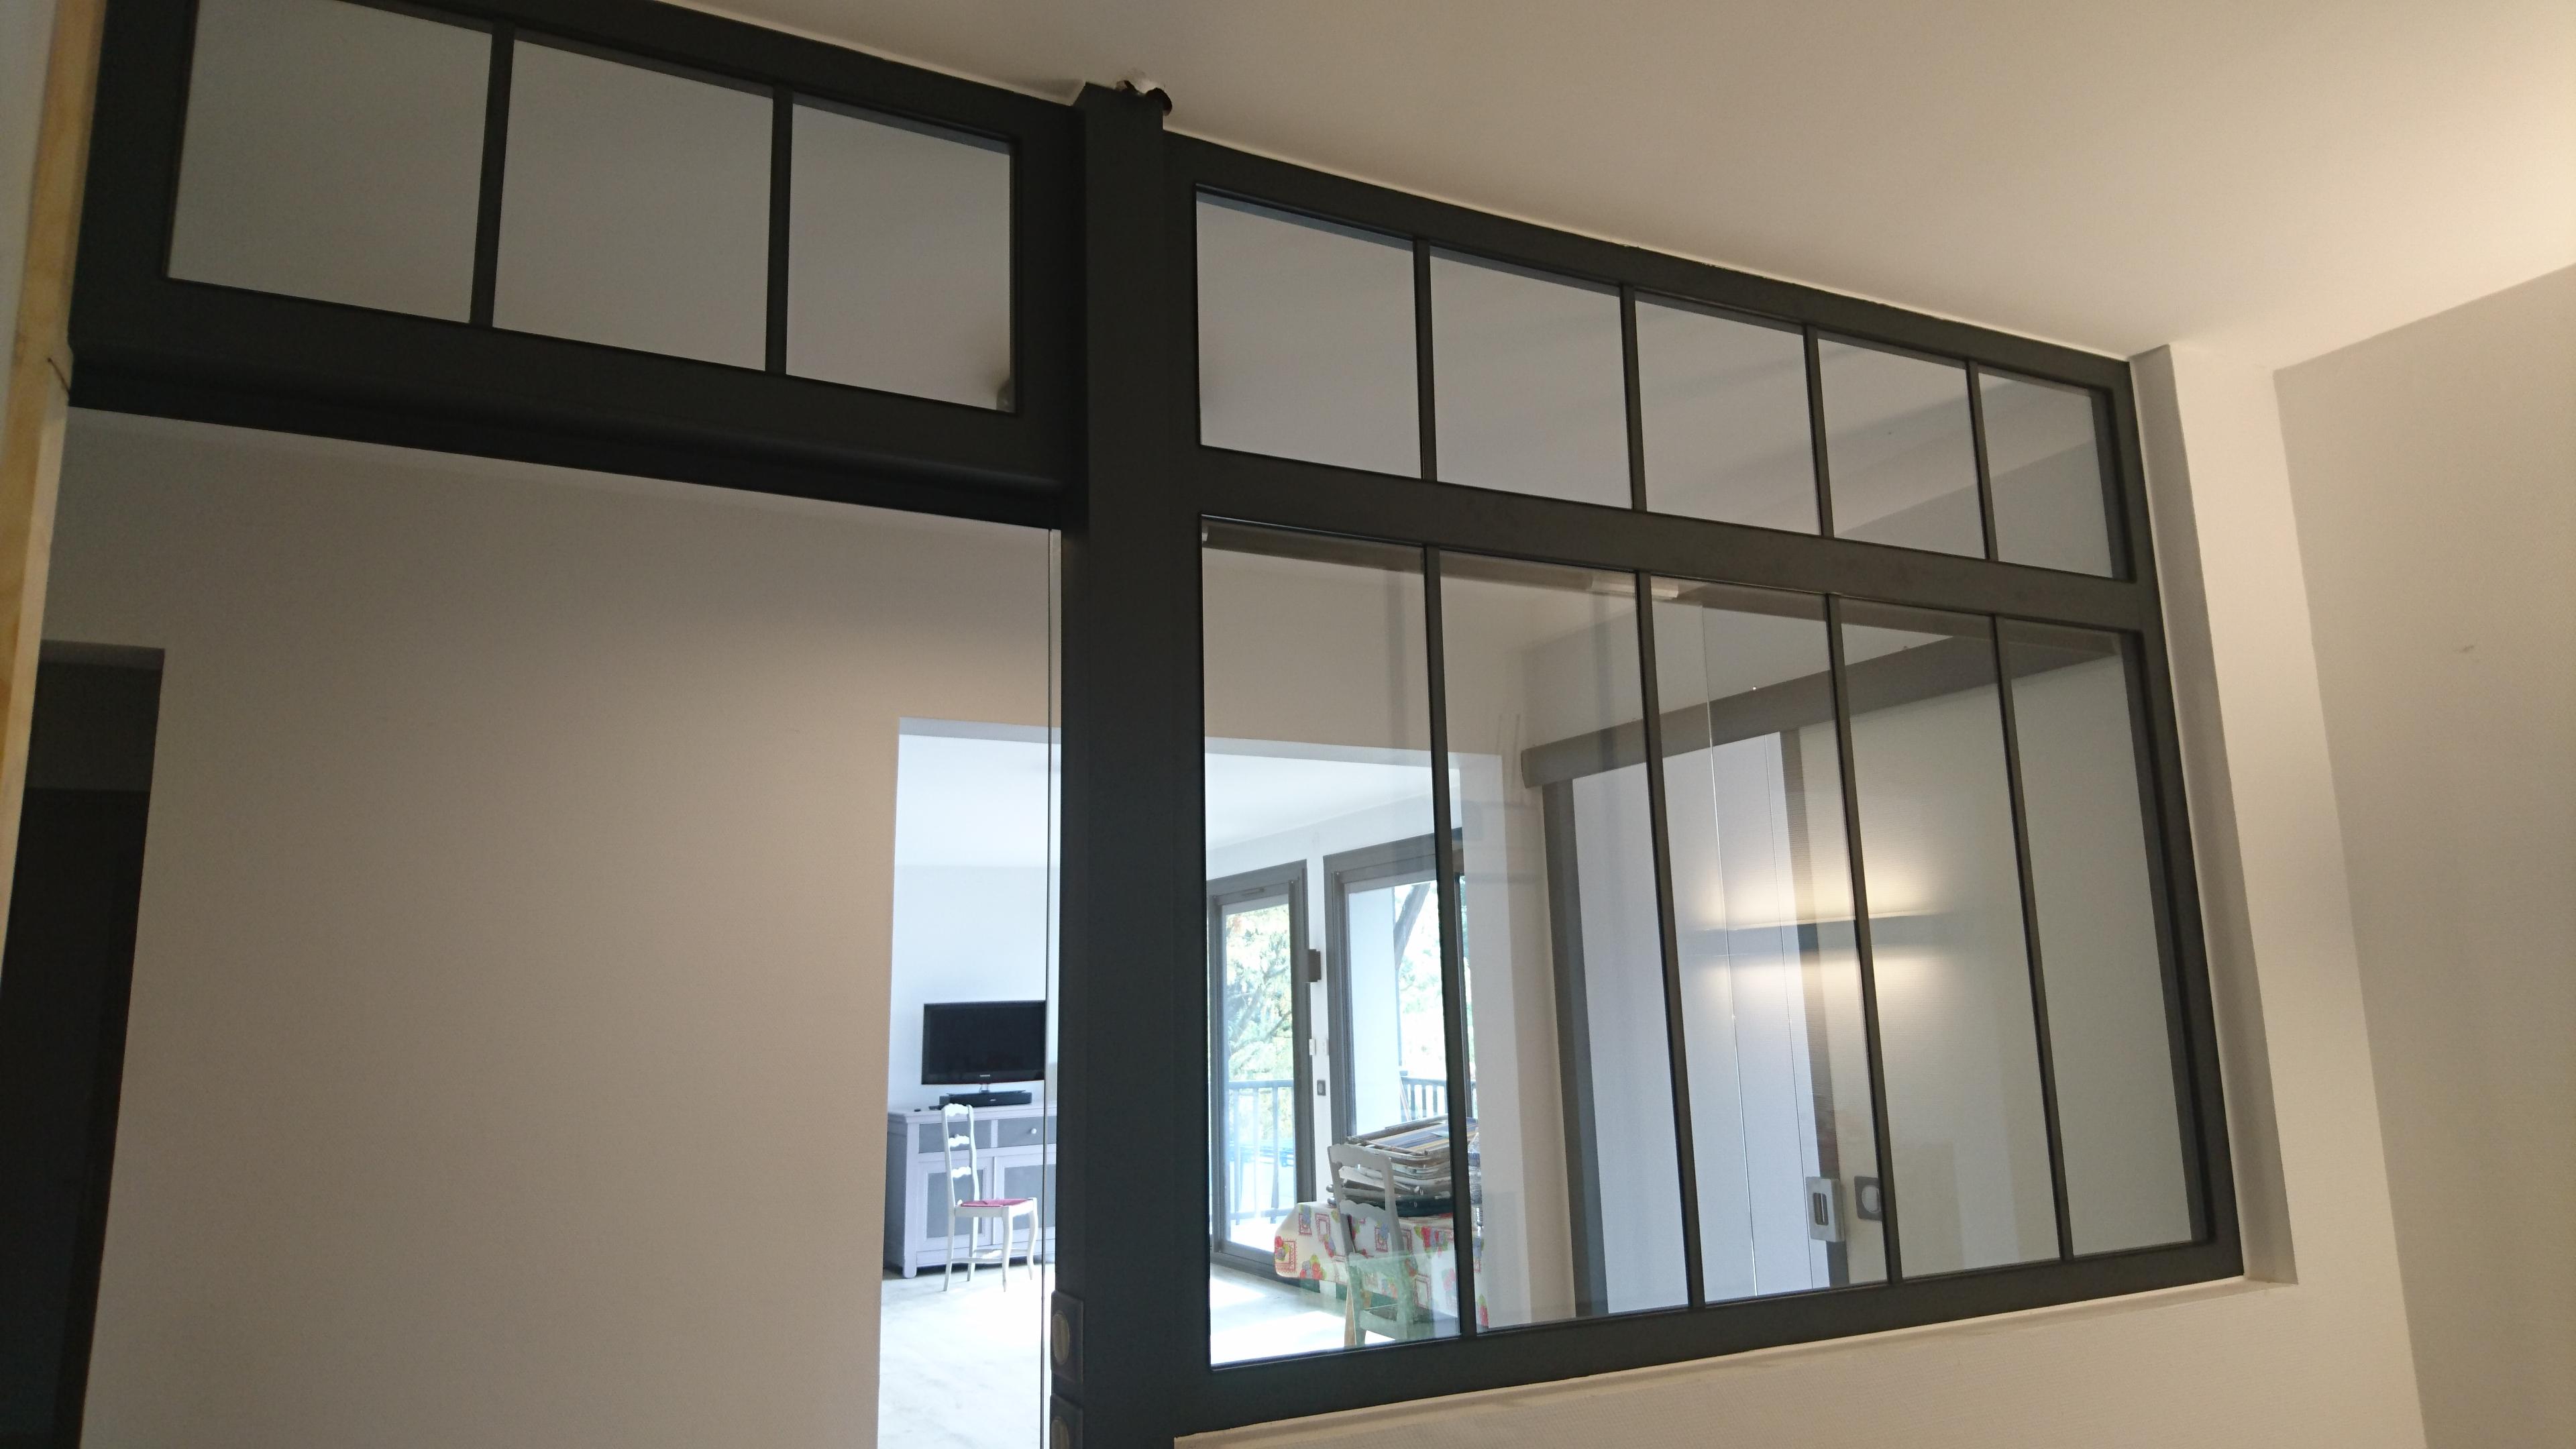 moderniser une porte int rieure vitr e. Black Bedroom Furniture Sets. Home Design Ideas